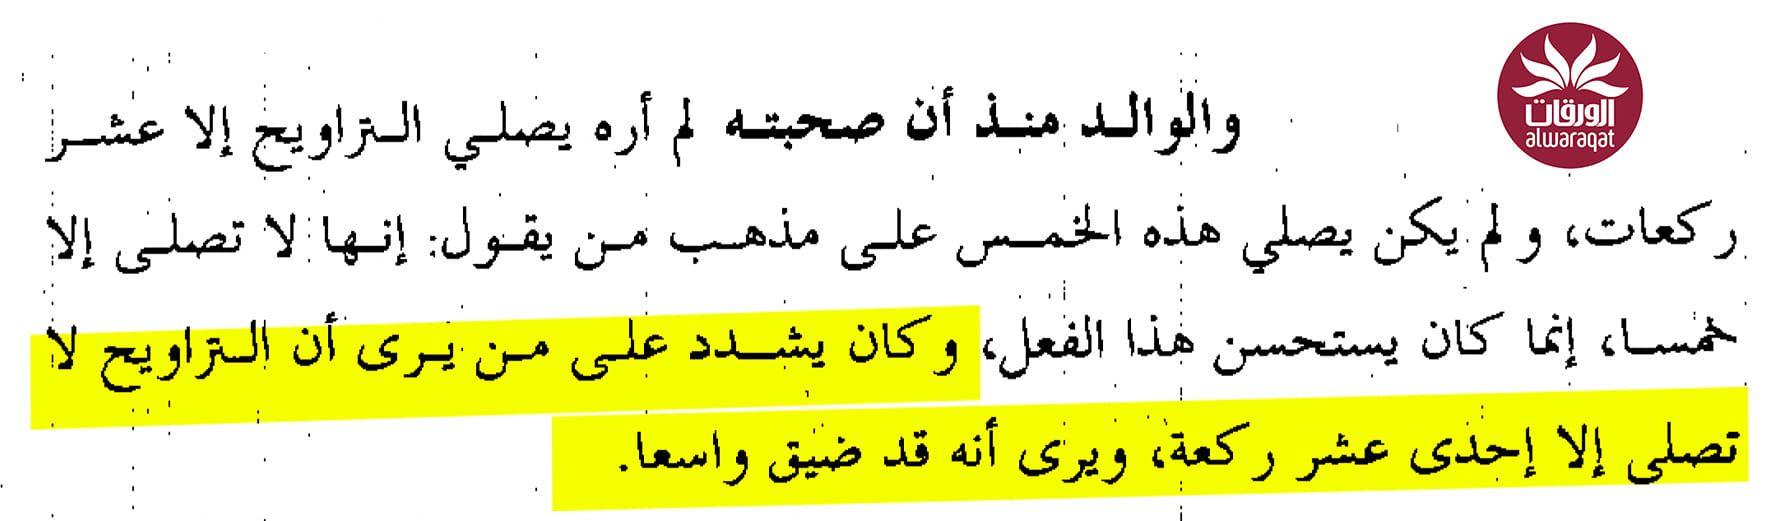 Hammed3 Math Arabic Calligraphy Calligraphy